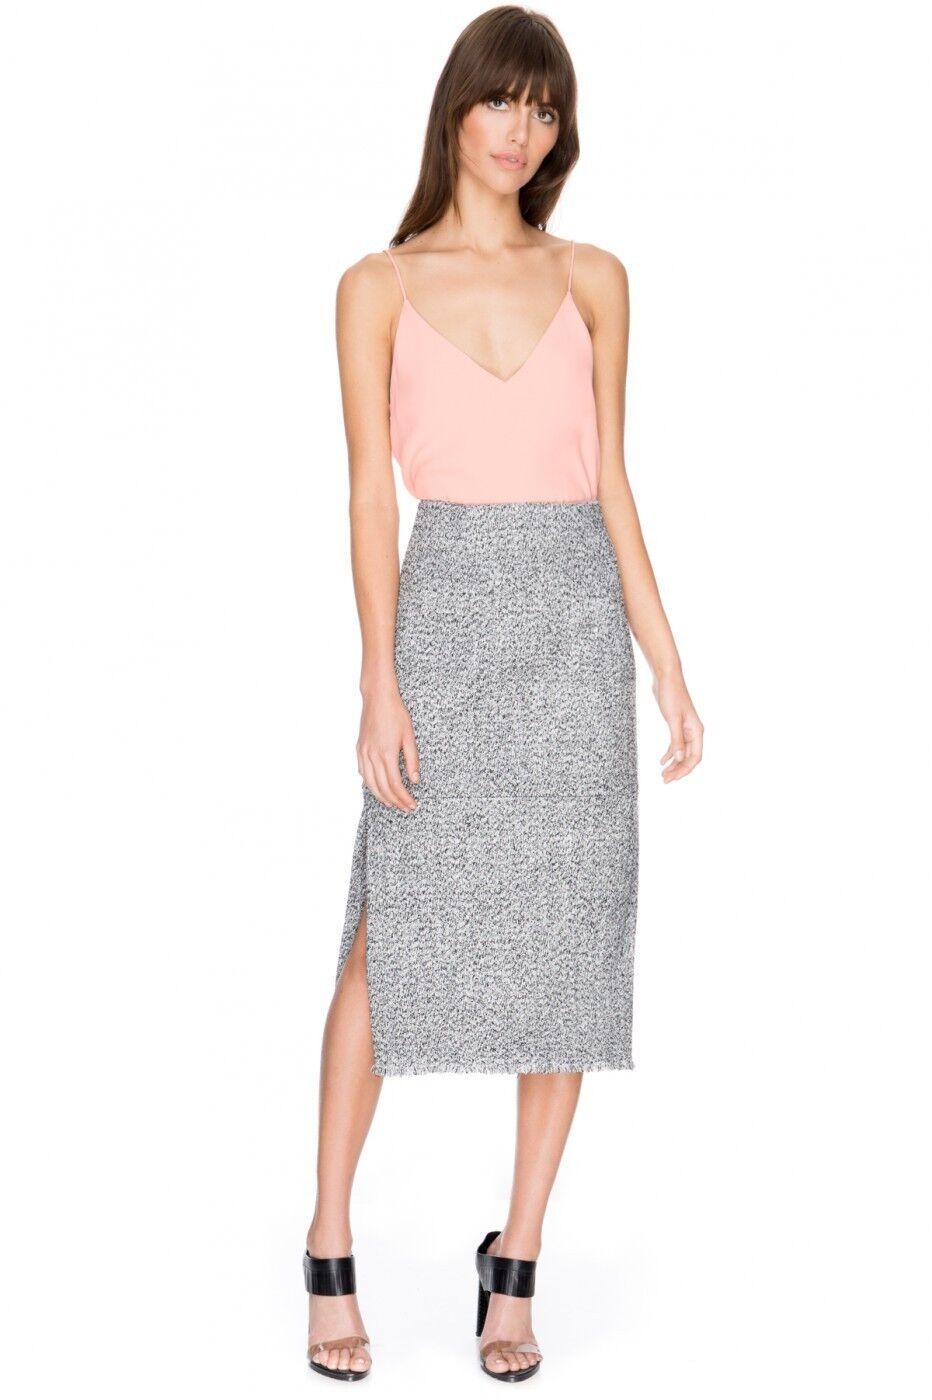 C MEO COLLECTIVE Last Call Heavyweight metallic High waist Skirt Medium NWT